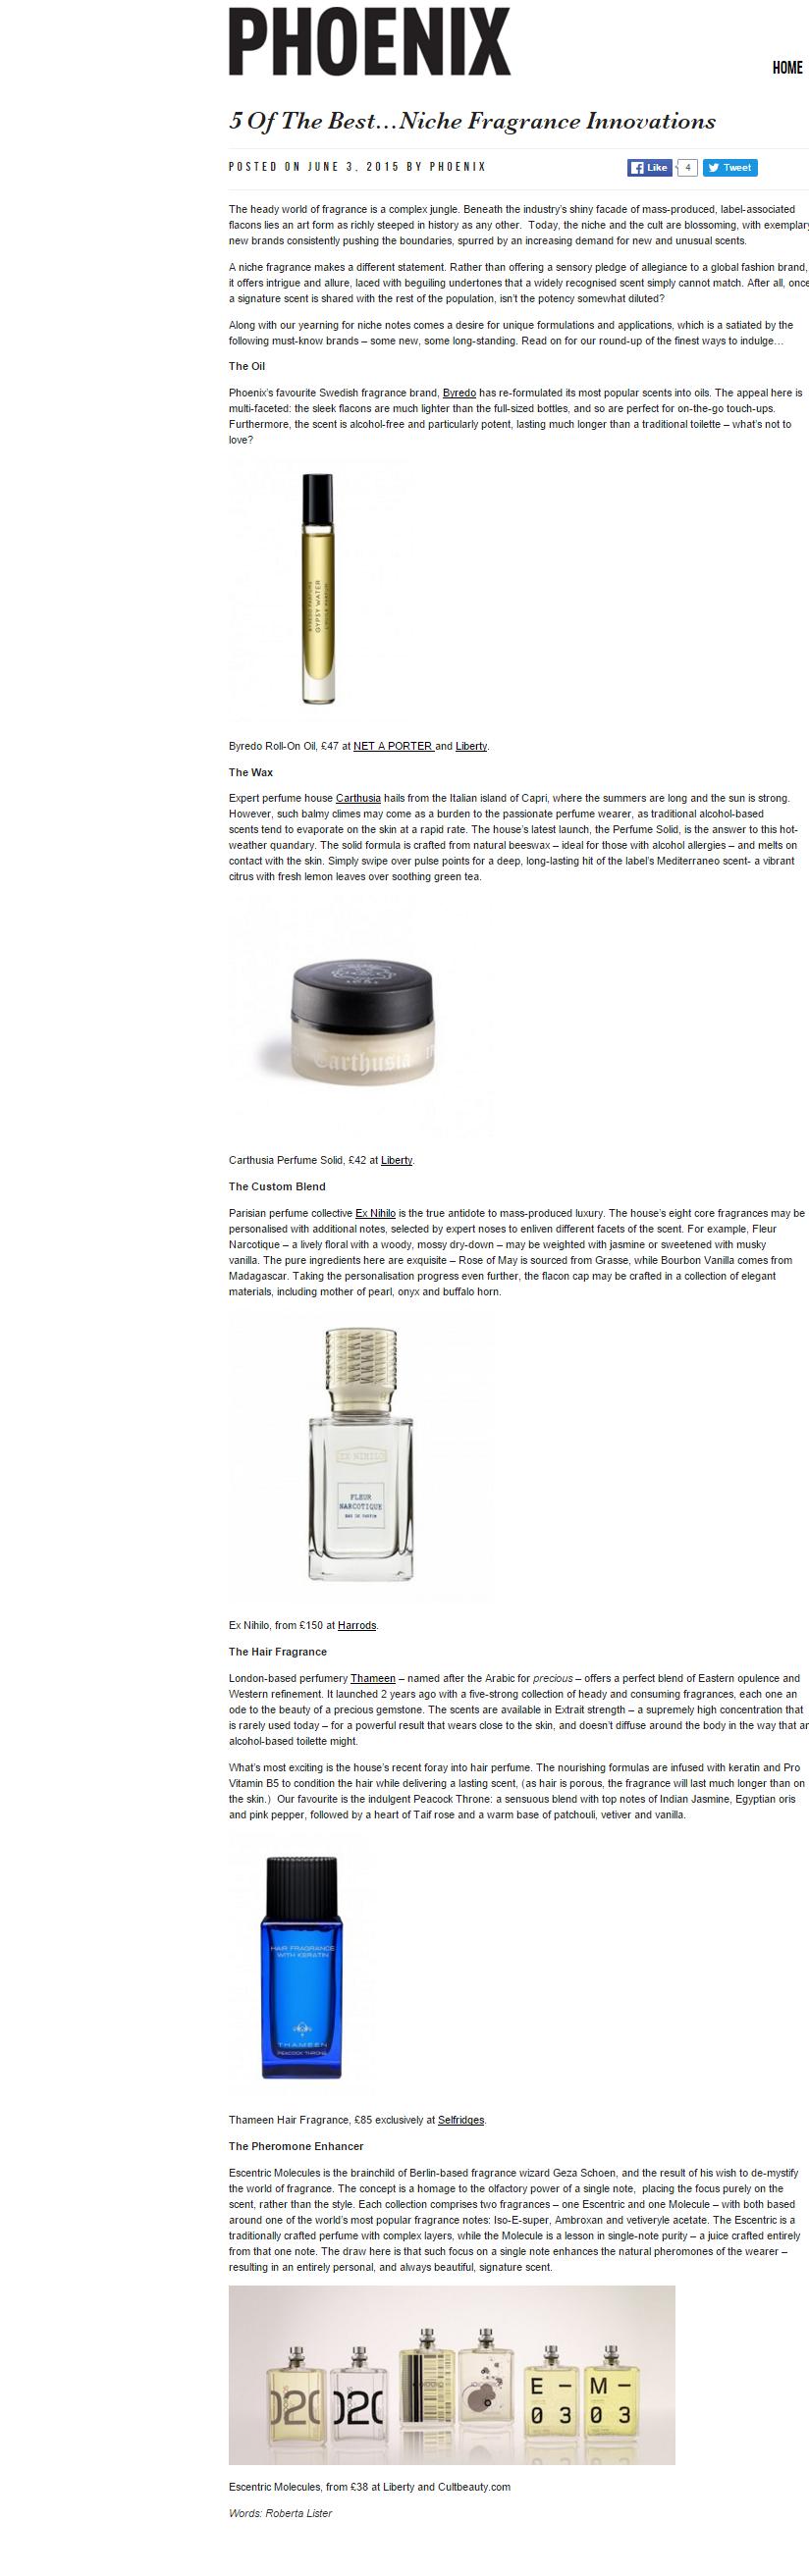 niche fragrance